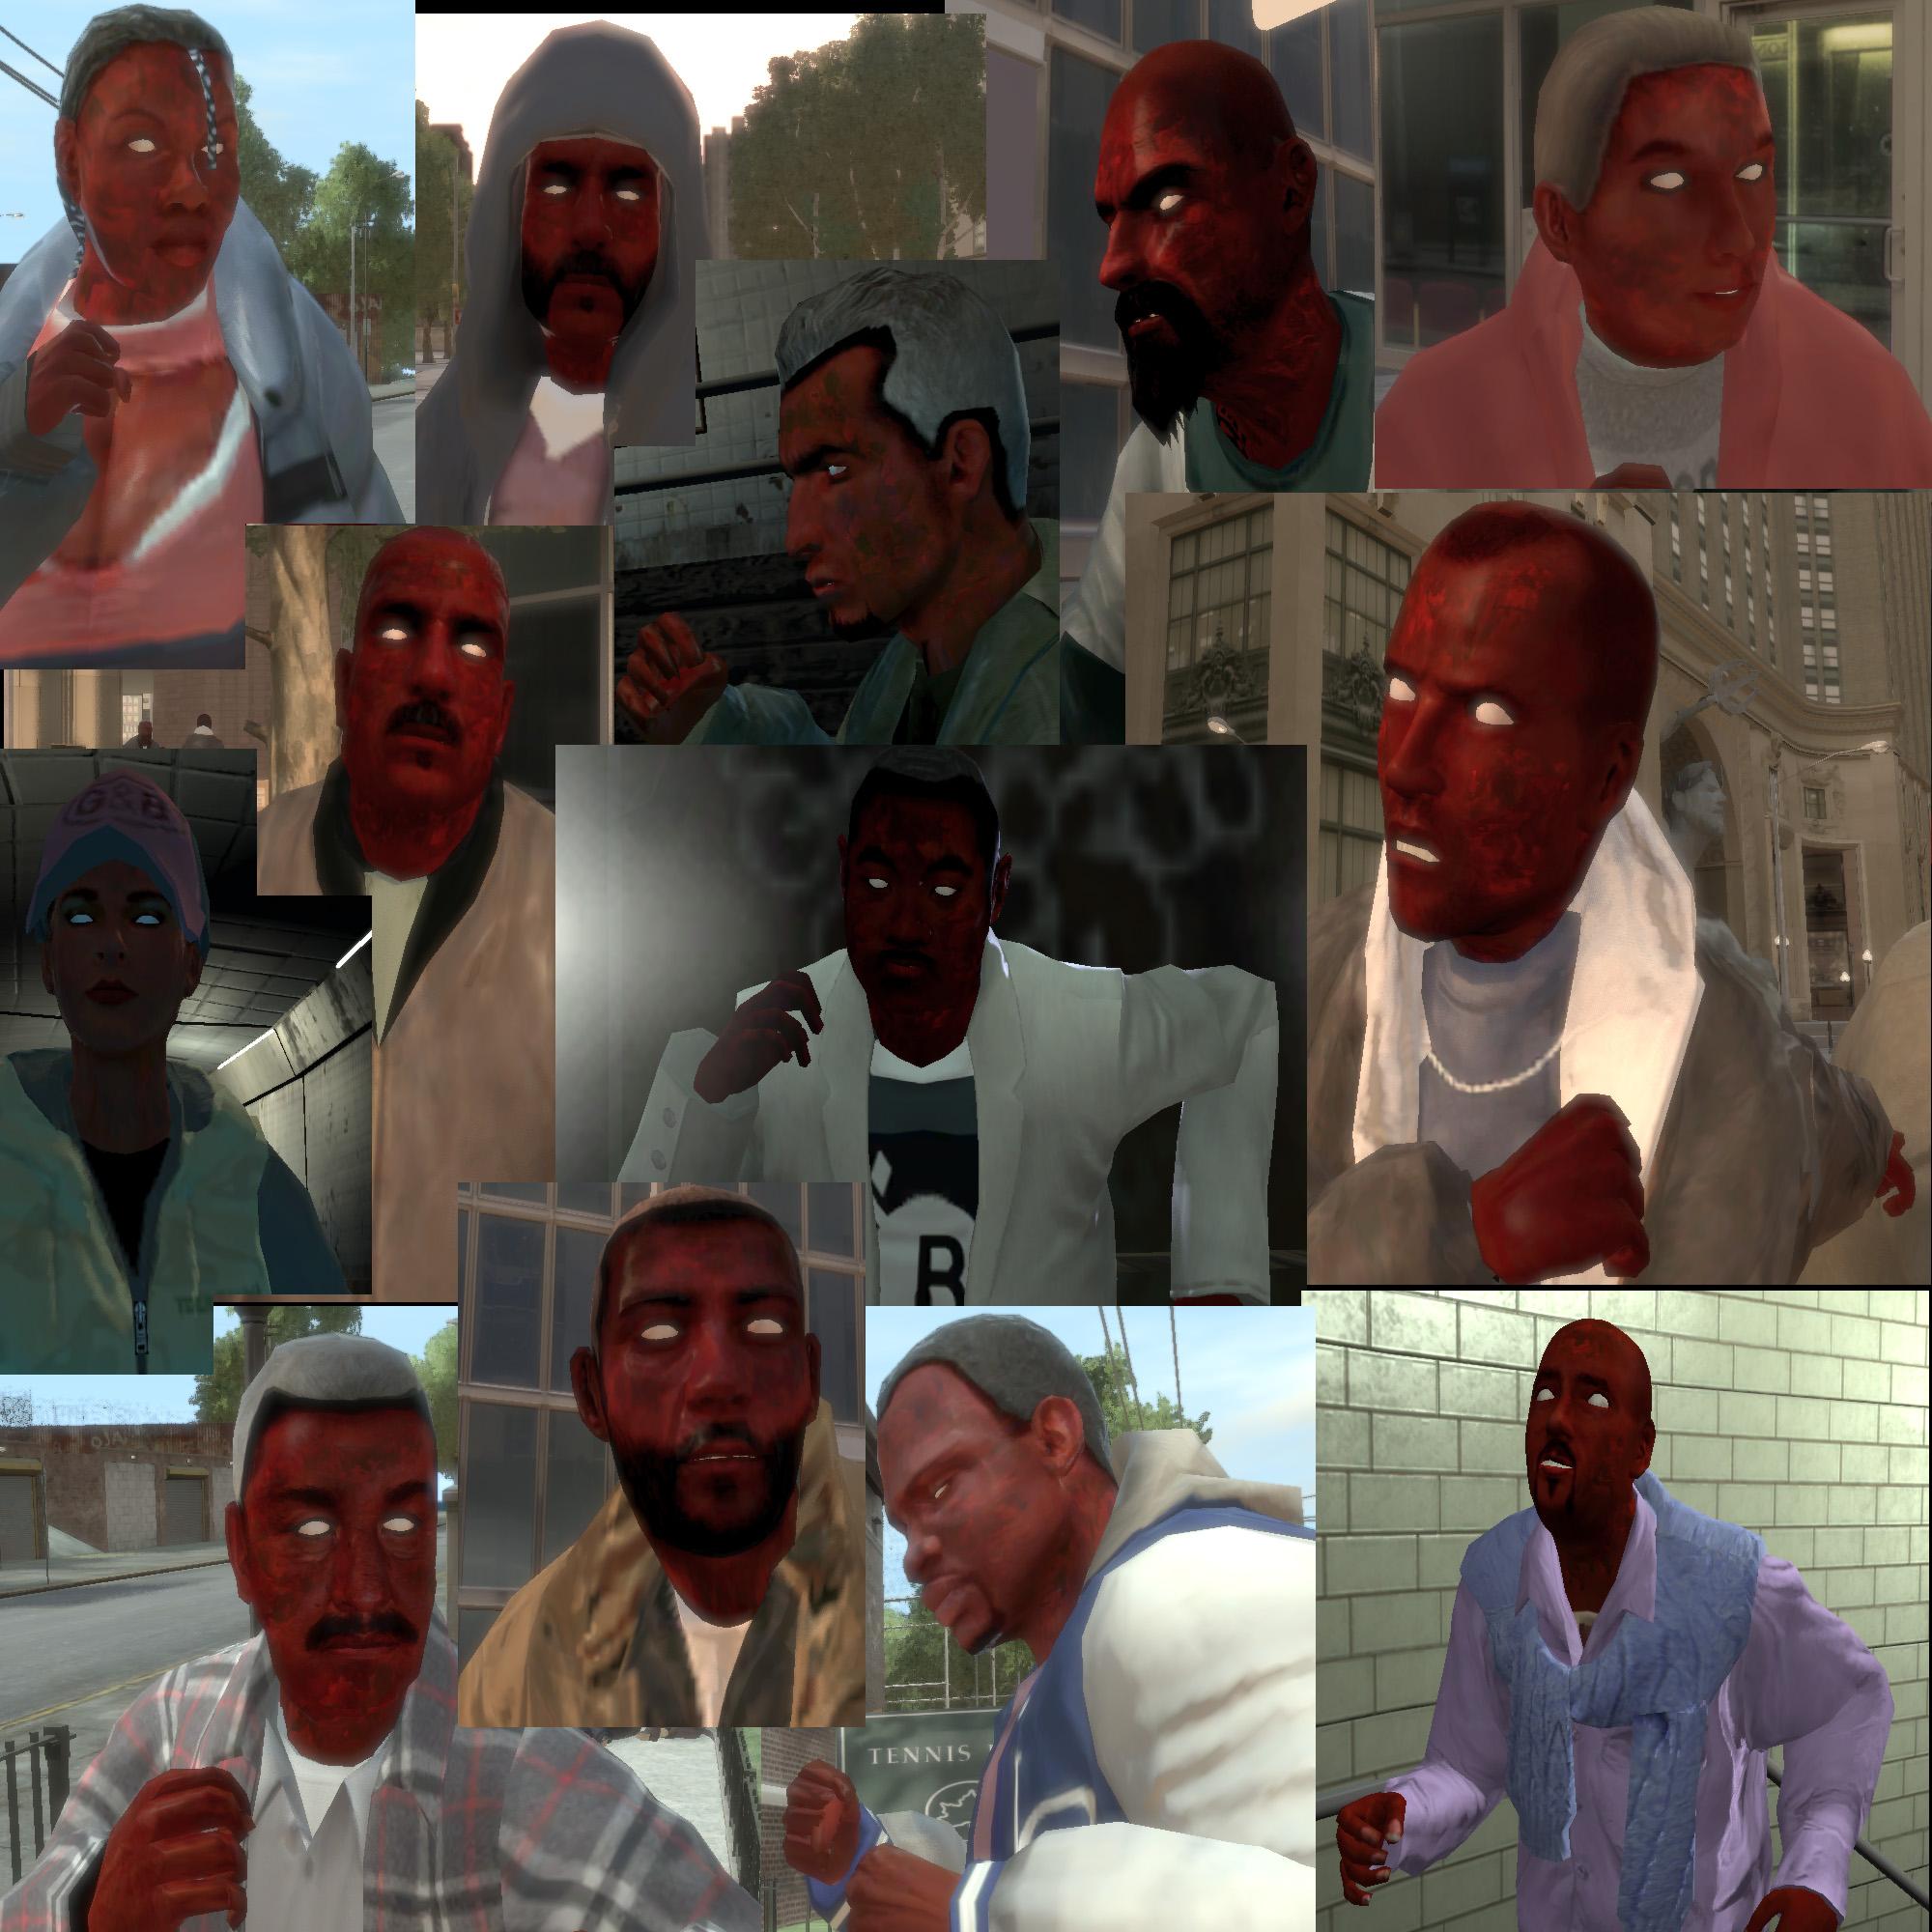 Gta 5 Garage: GTAGarage.com » GTA 4 Zombie Apocalypse » View Screenshot